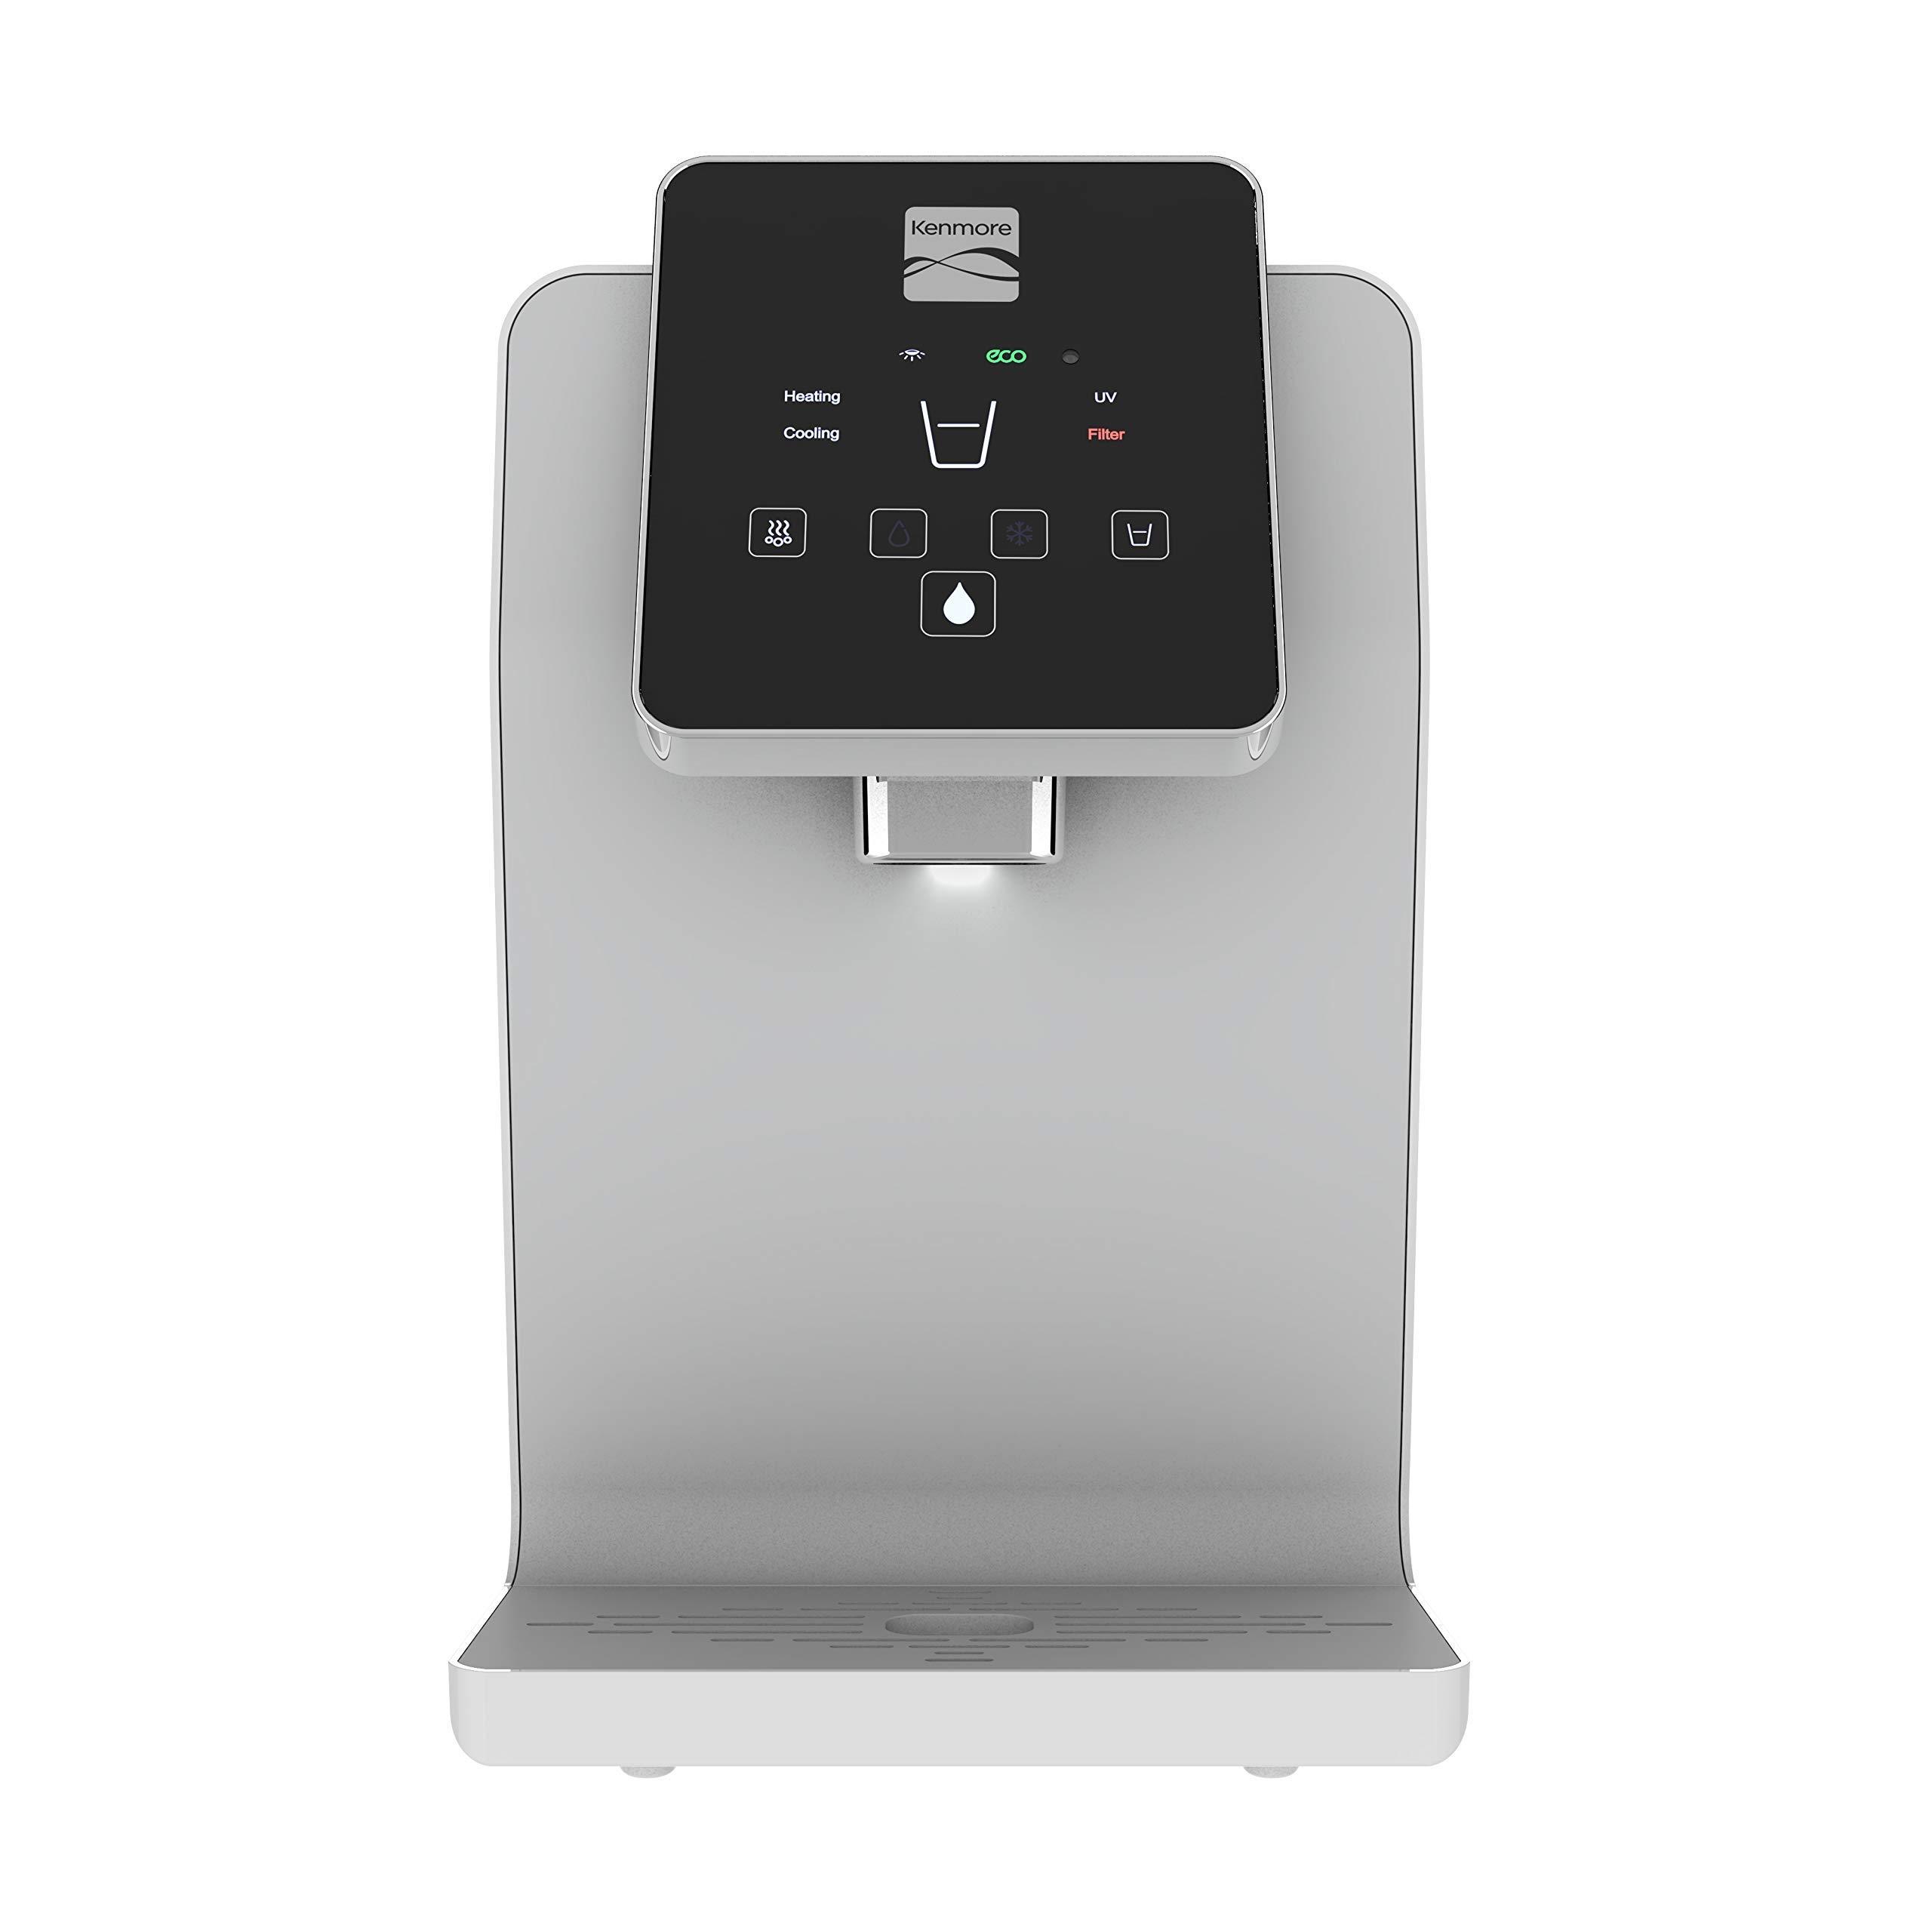 Kenmore Water Dispenser Optimizer (White) - Countertop Water Cooler • Botteleless Water Dispenser by Kenmore